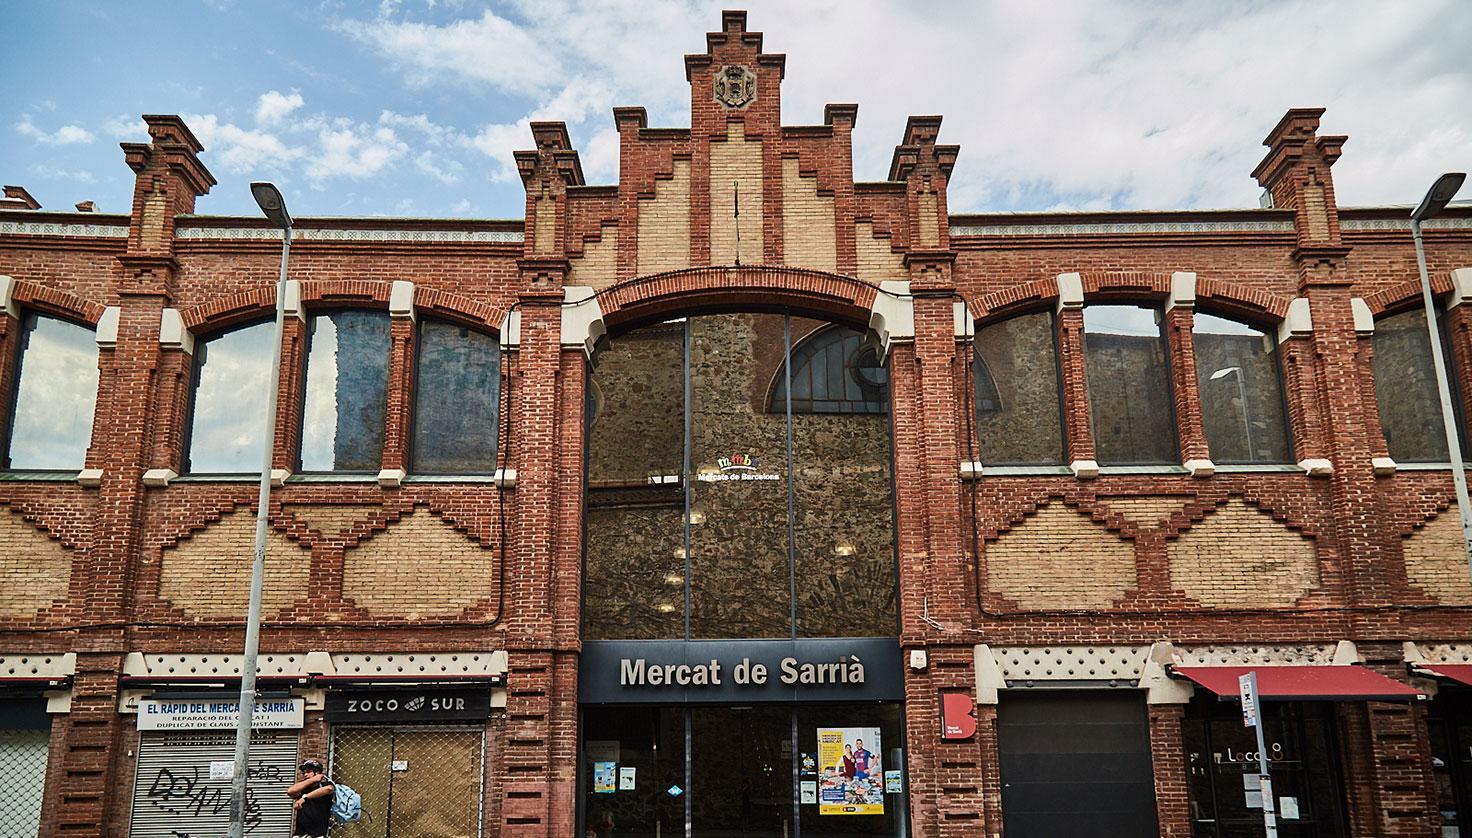 Markthalle Sarrià - Arnau Calvet fotografie